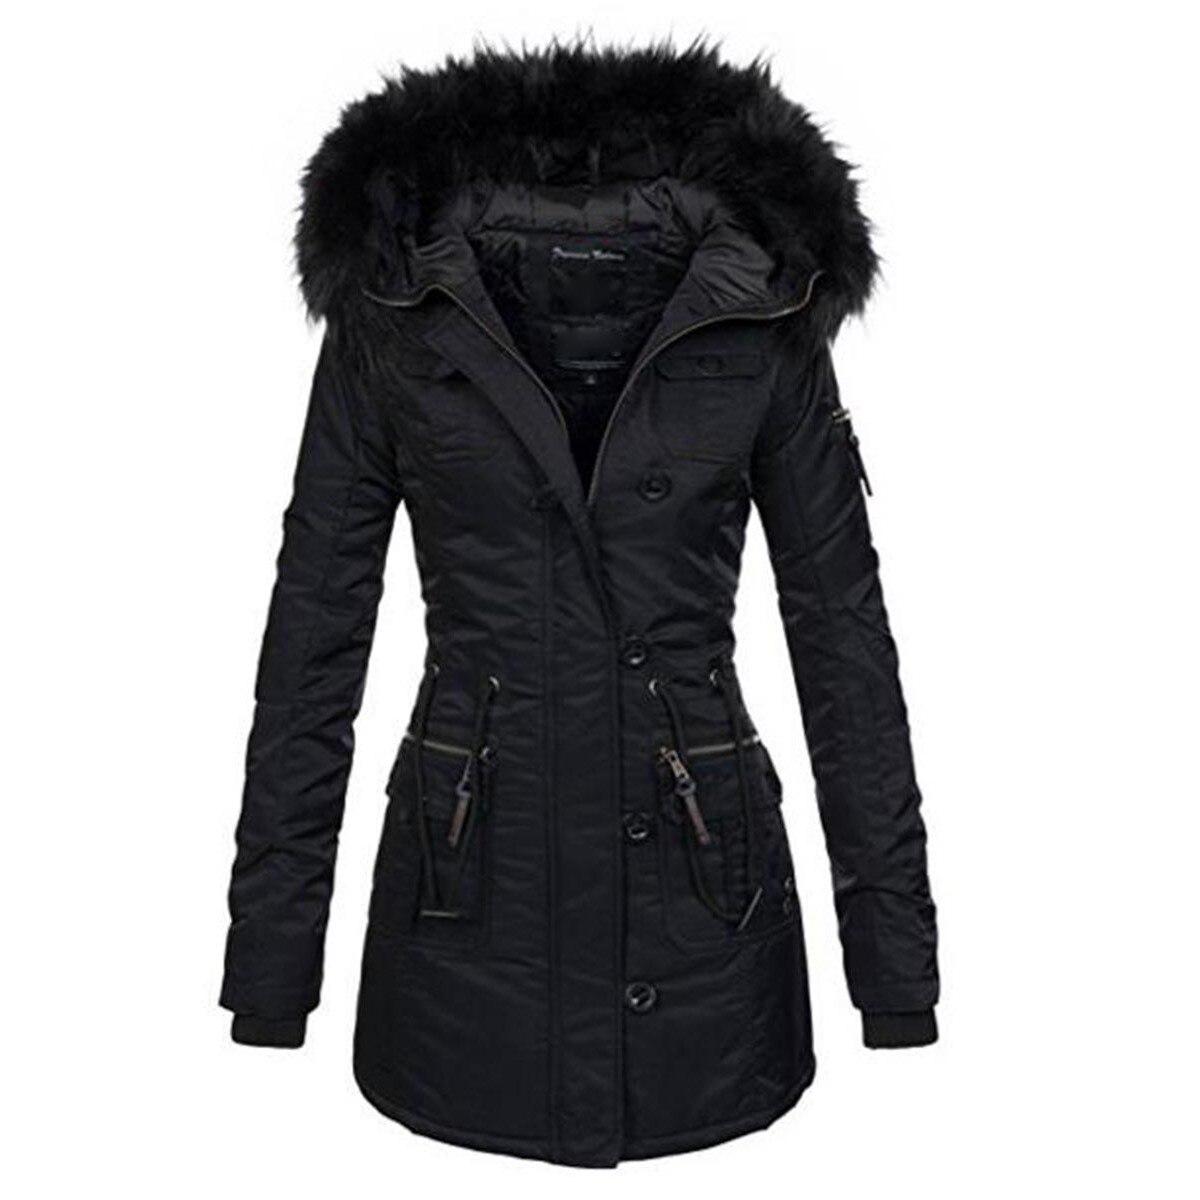 Gothic women winter thicken warm cotton coat long Black fake fur Hooded parkas Slim Pocket Zipper Female Casual plus size lady